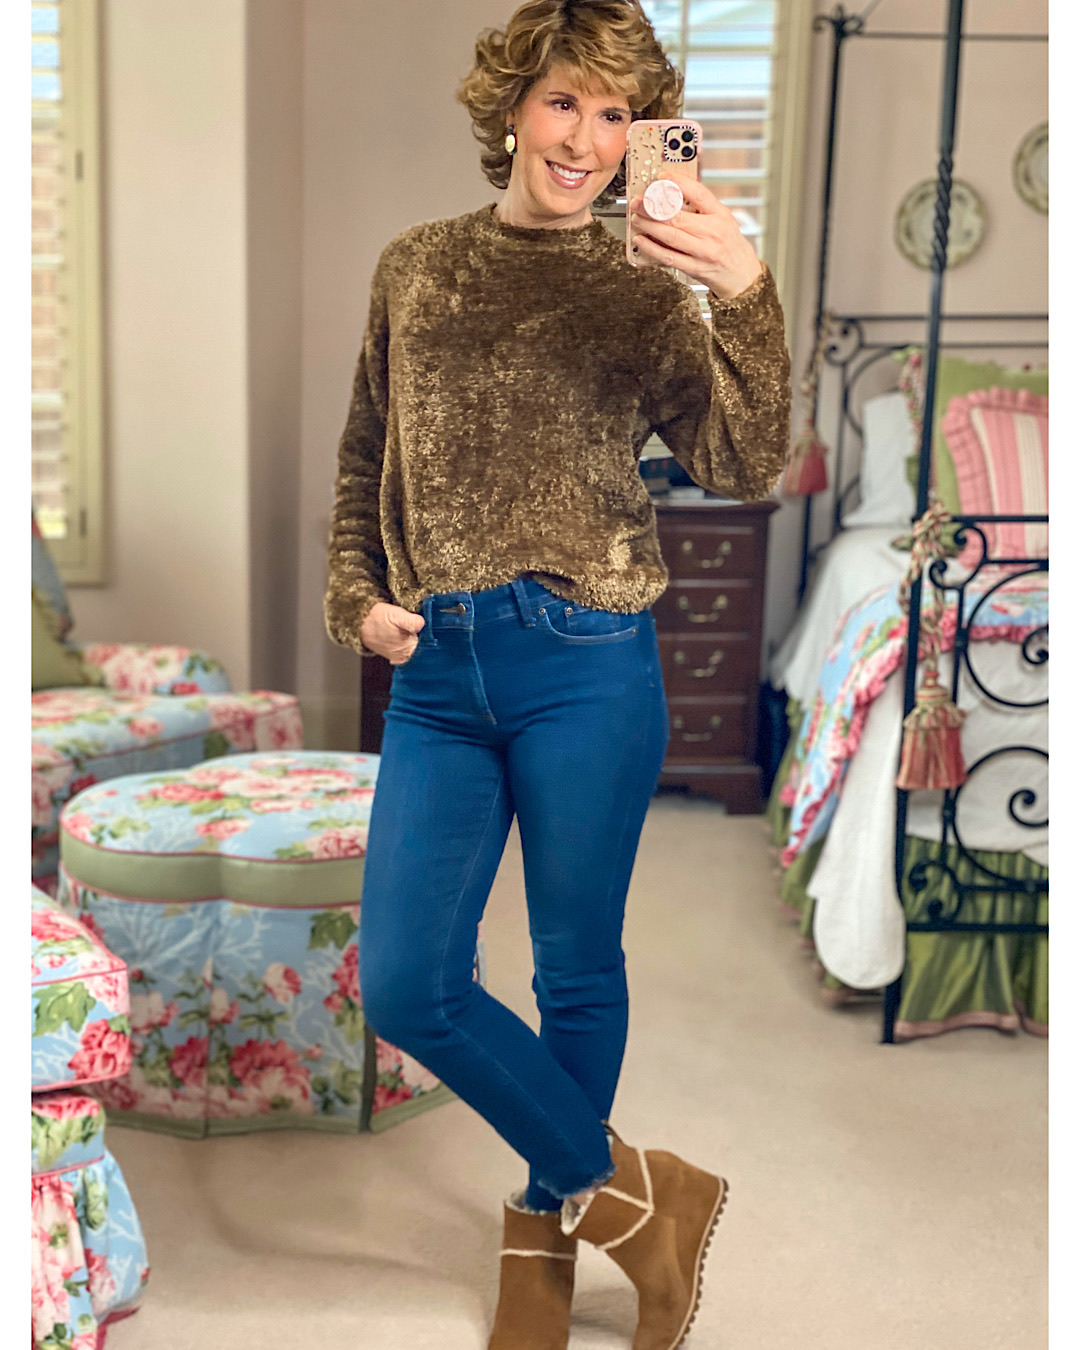 mirror selfie of woman in brown fuzzy sweater